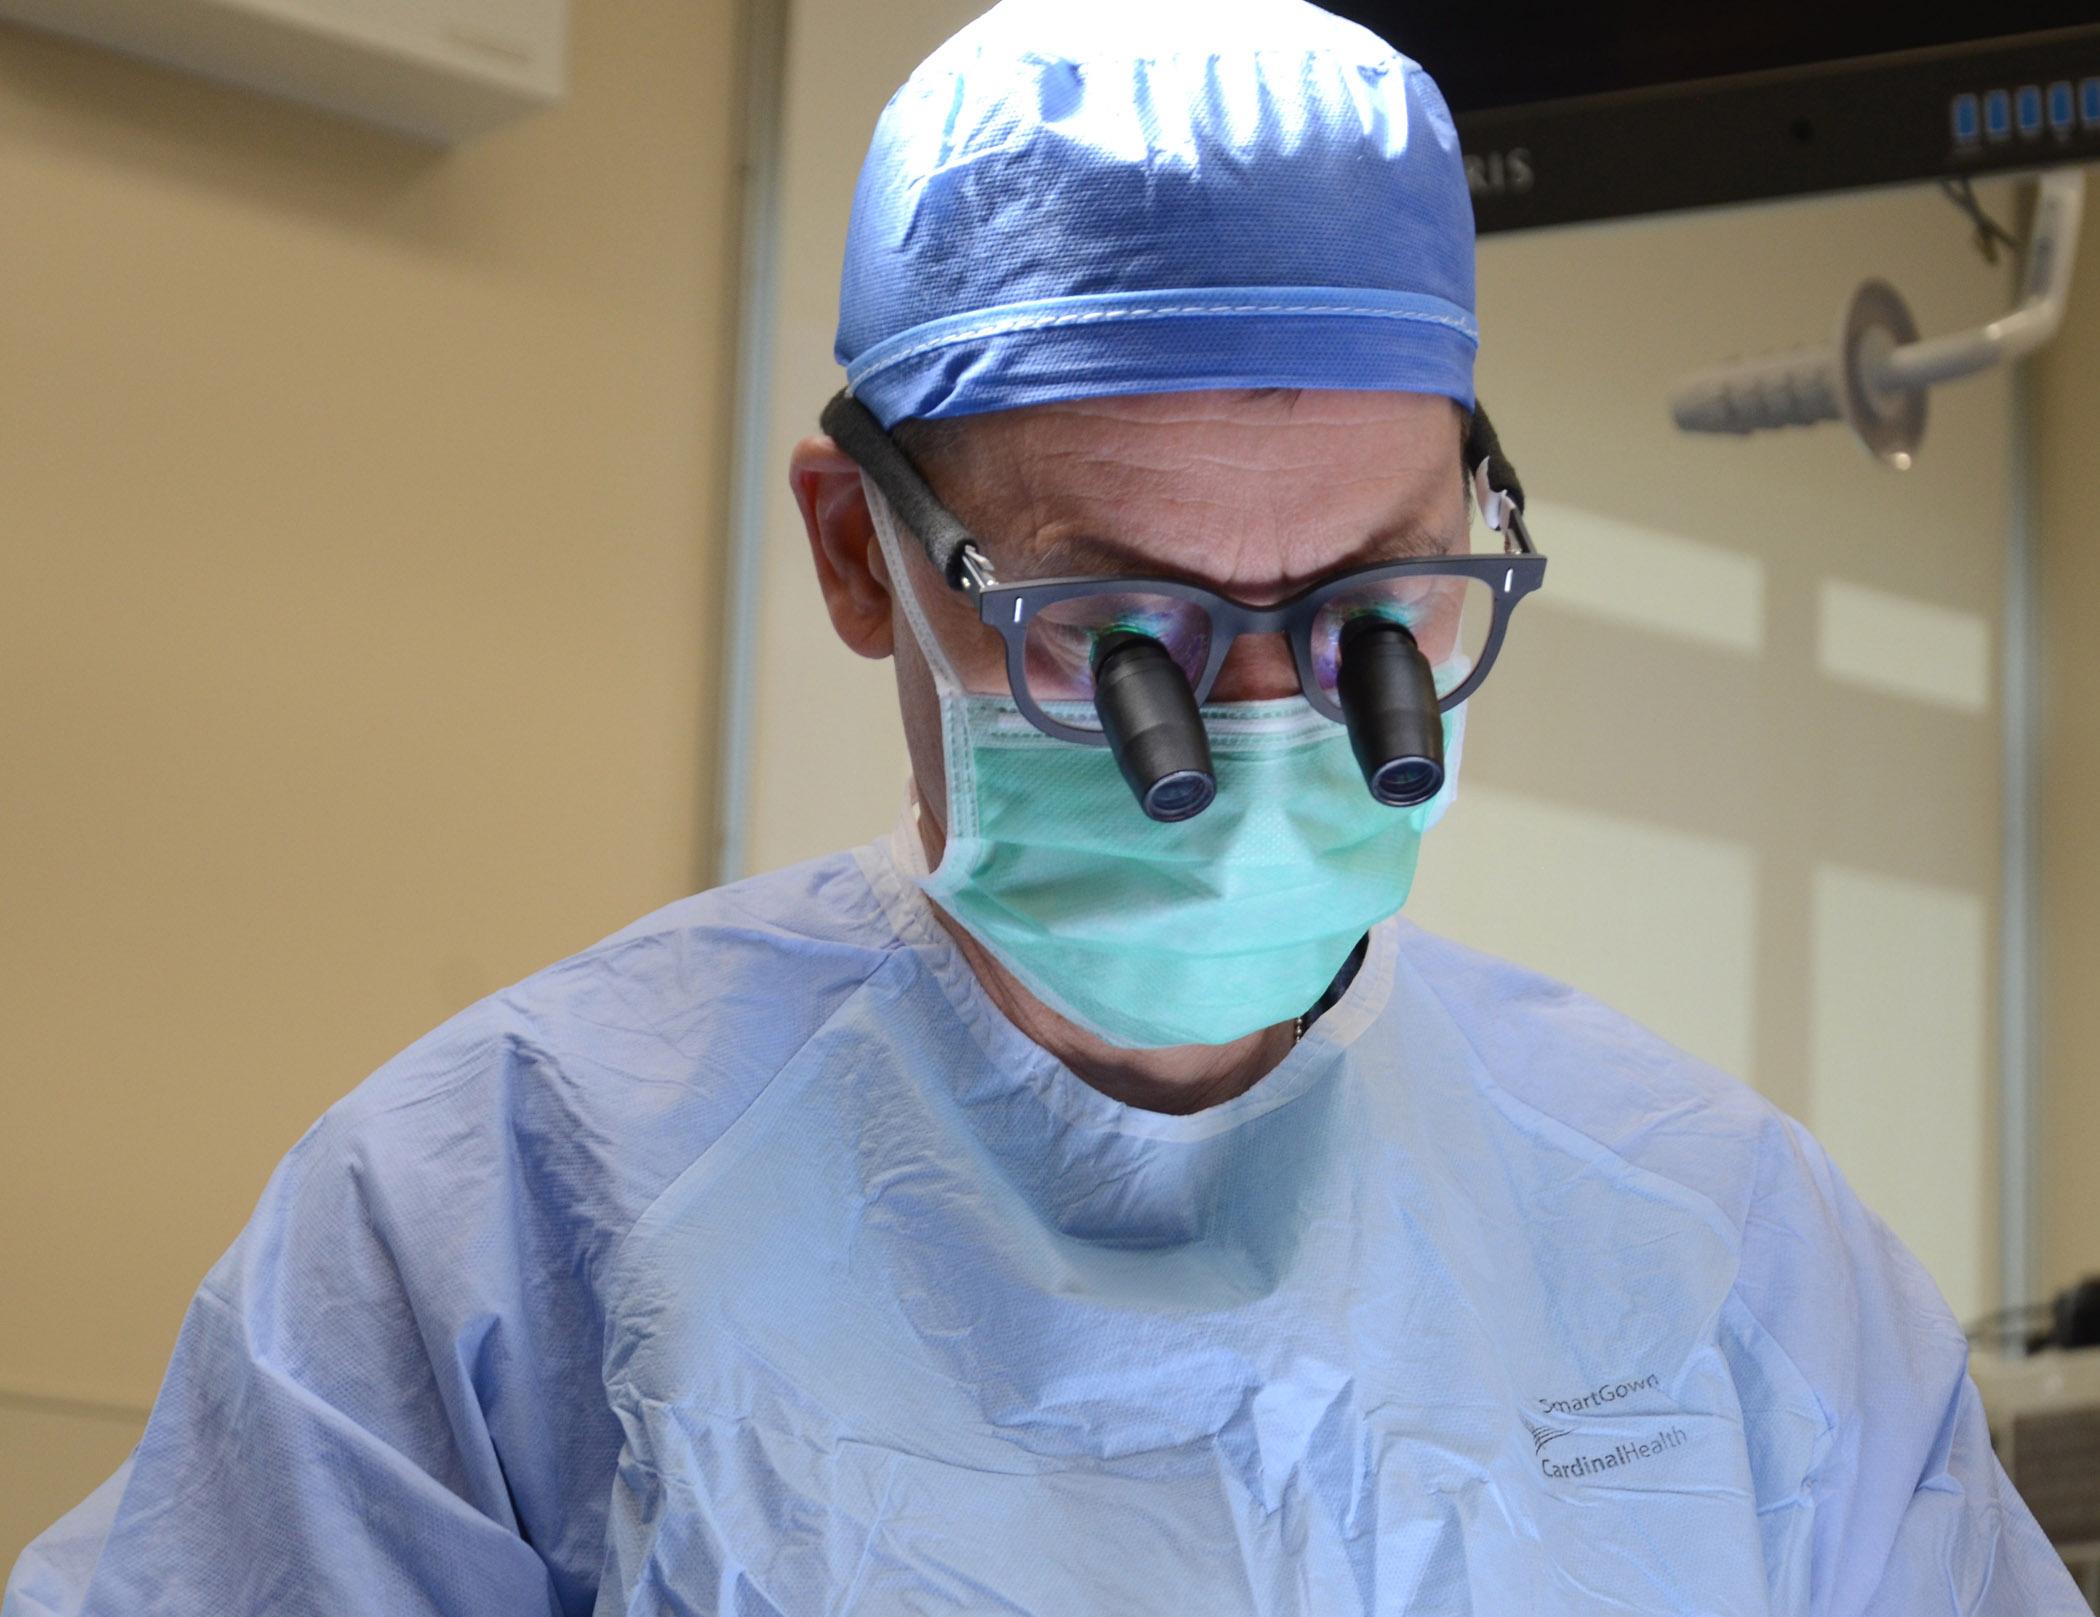 Santa Rosa Orthopaedics | Set the standard for orthopaedic care